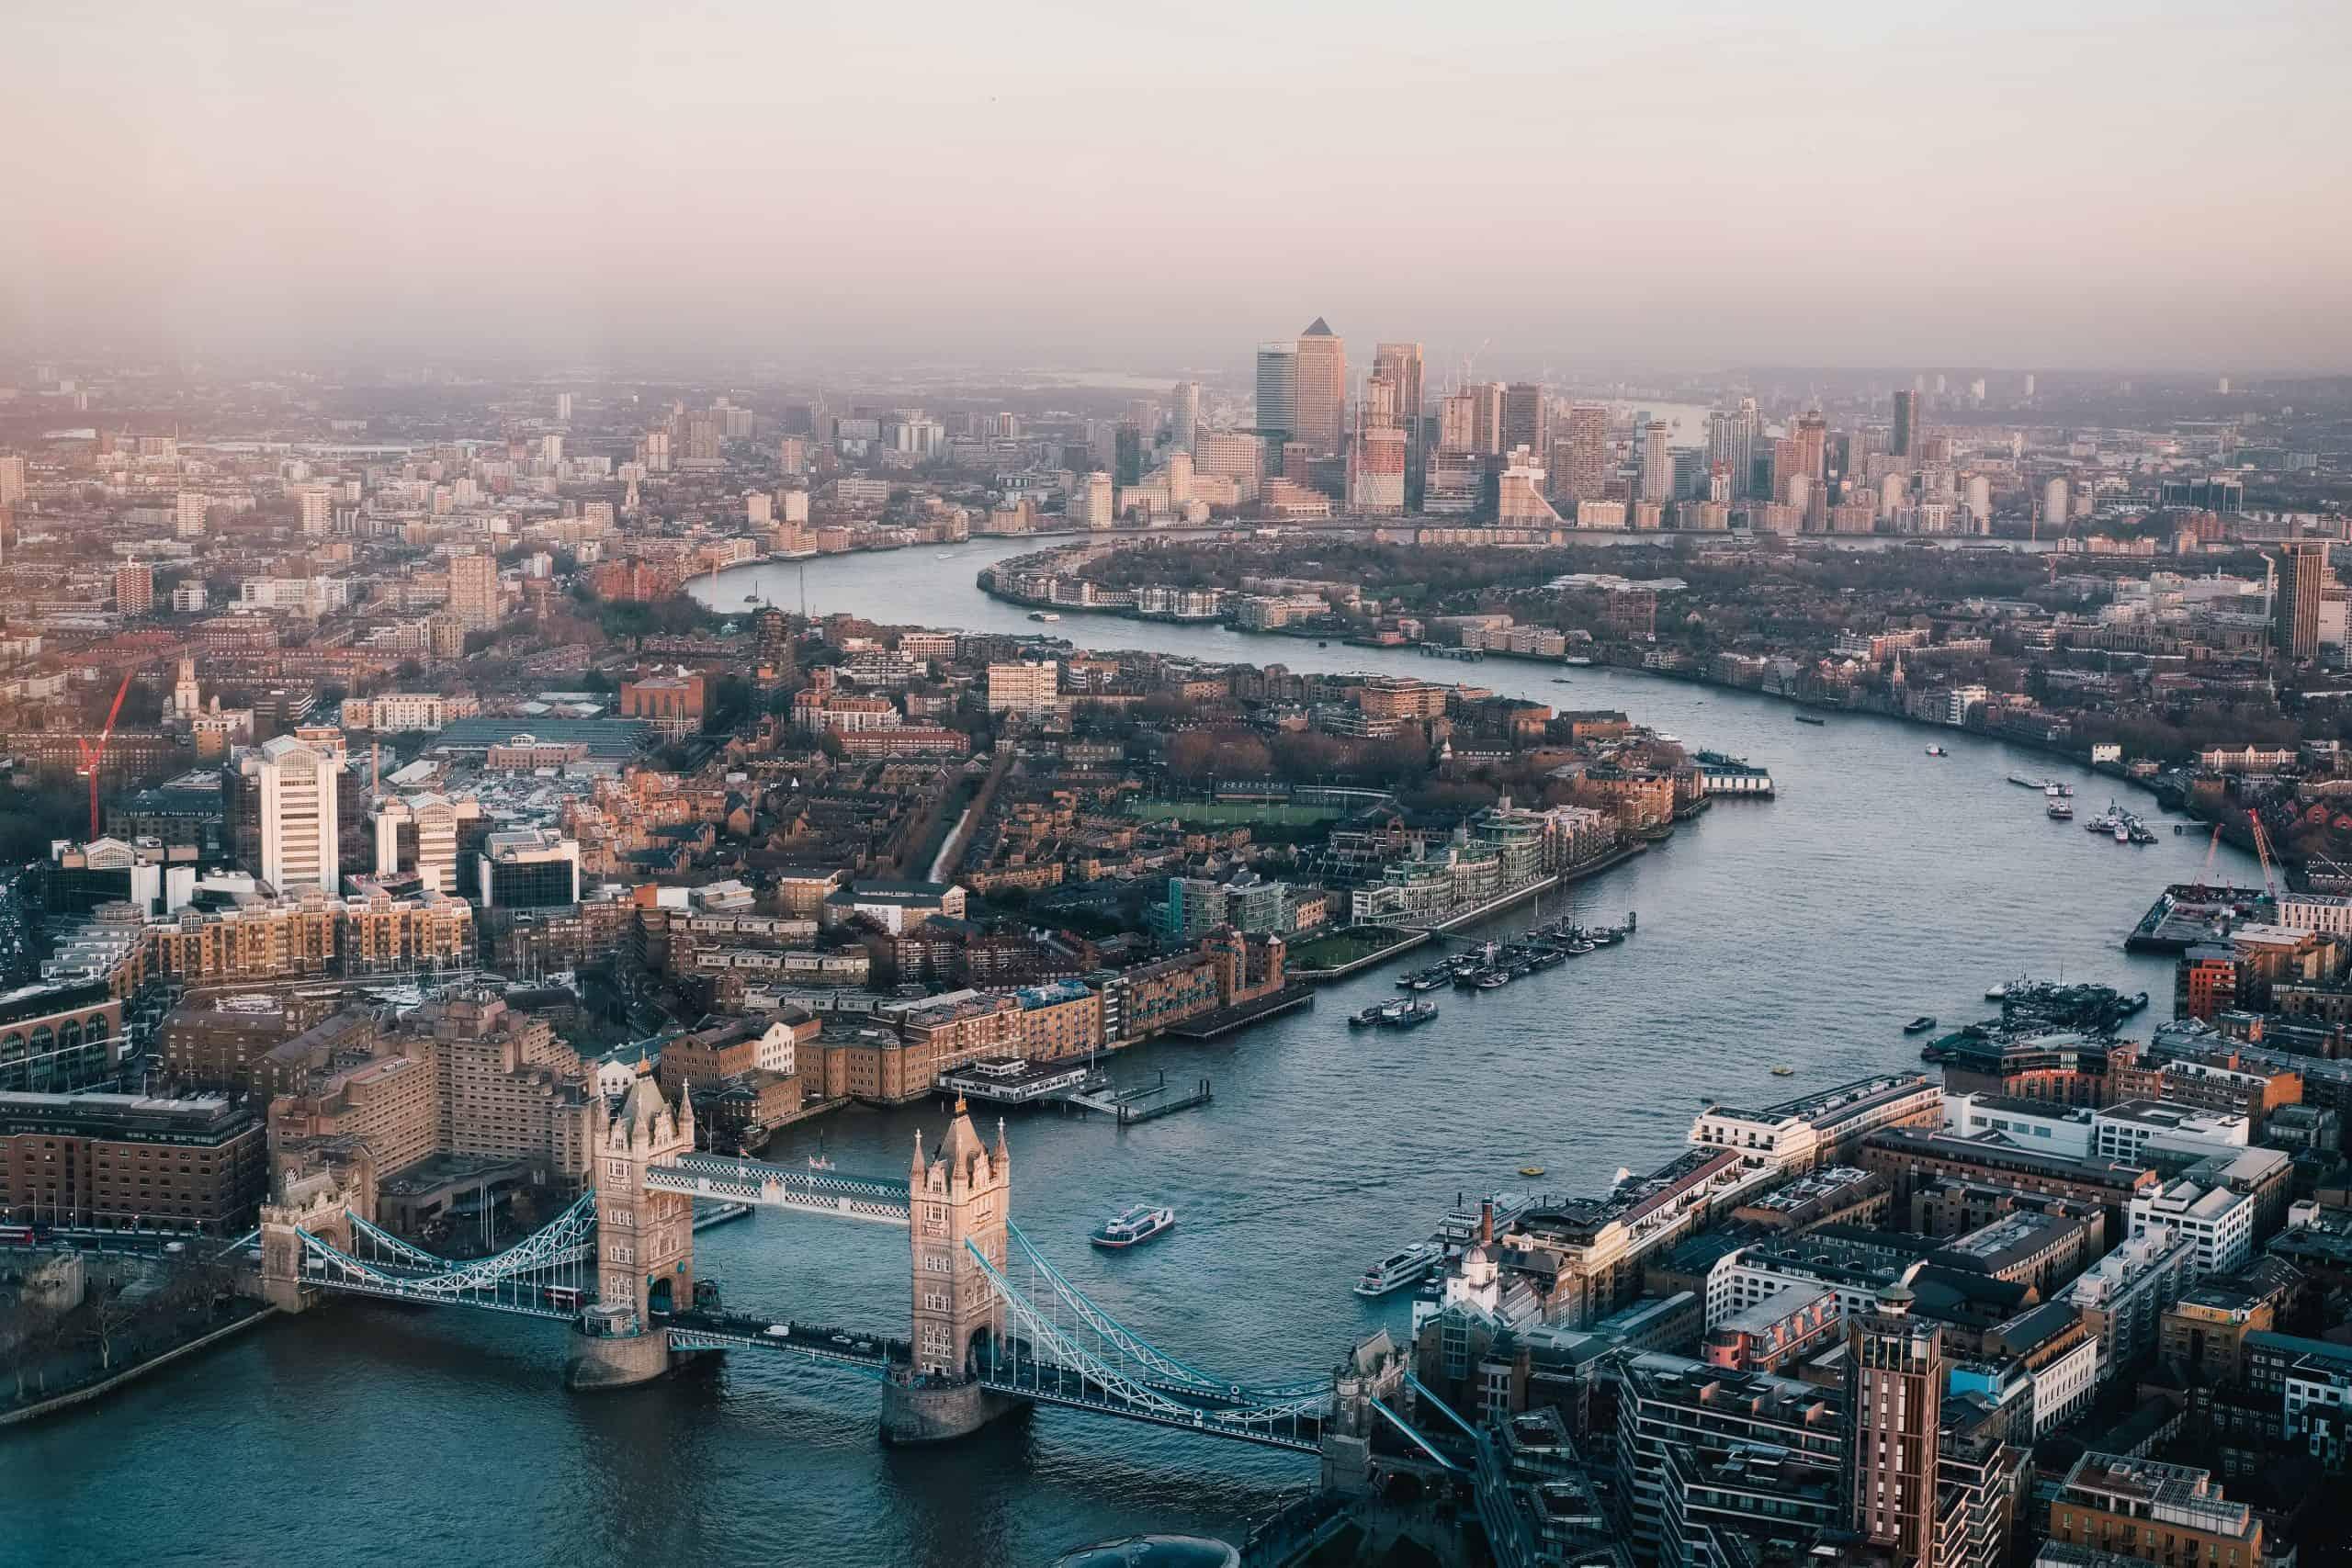 Immobilieninvestor aus Luxemburg kauft Bürogebäude in London